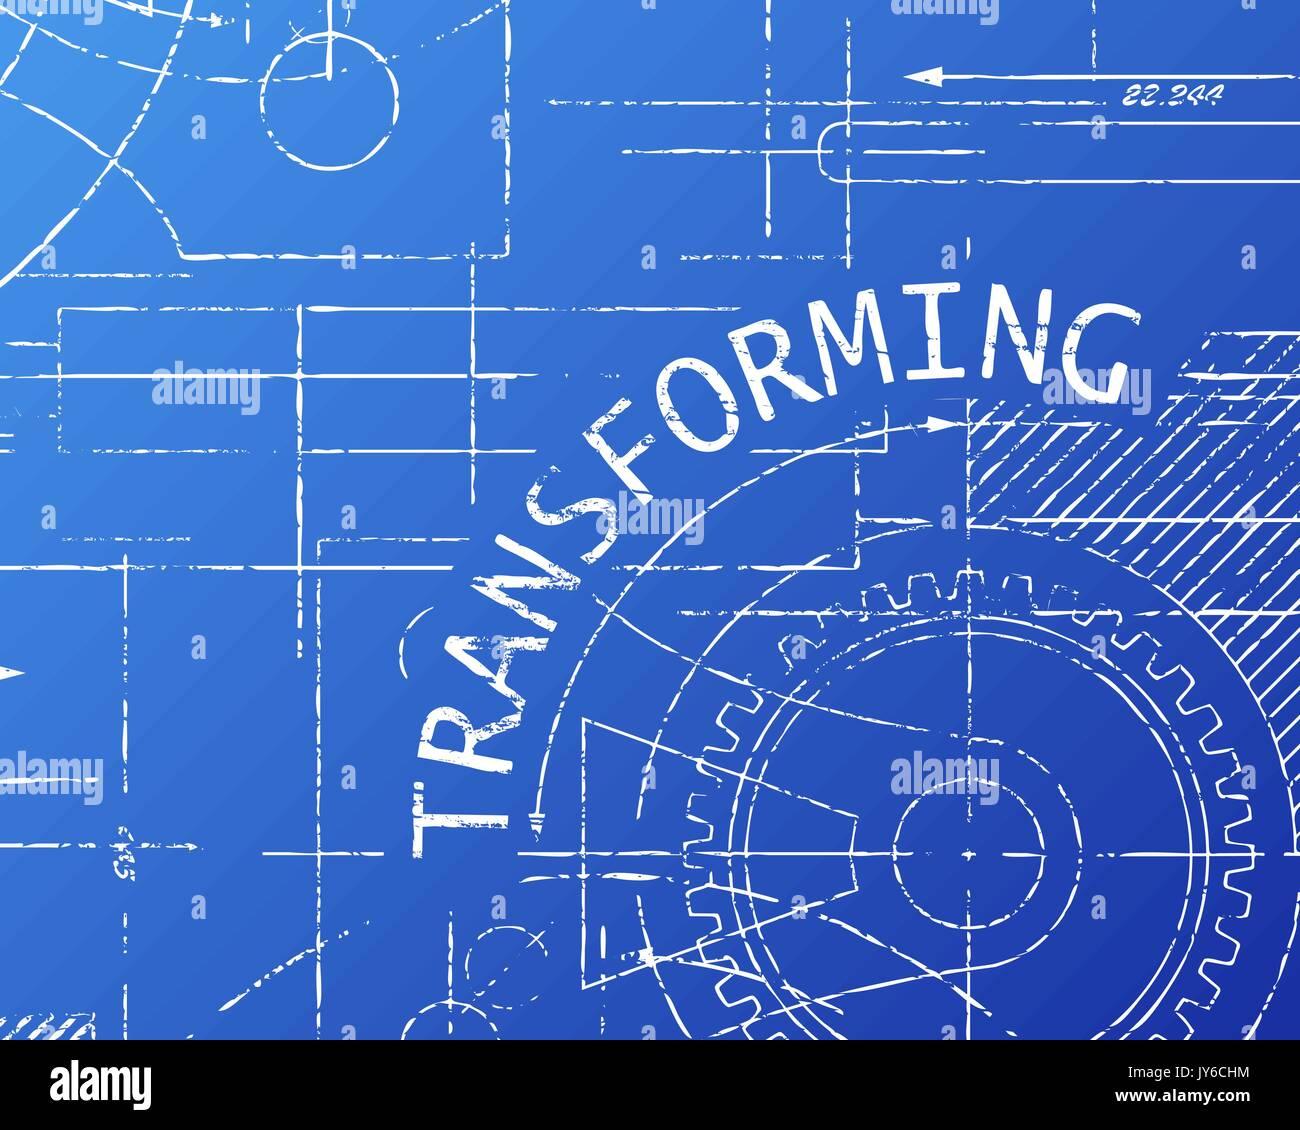 Transforming word on machine blueprint background illustration - Stock Image